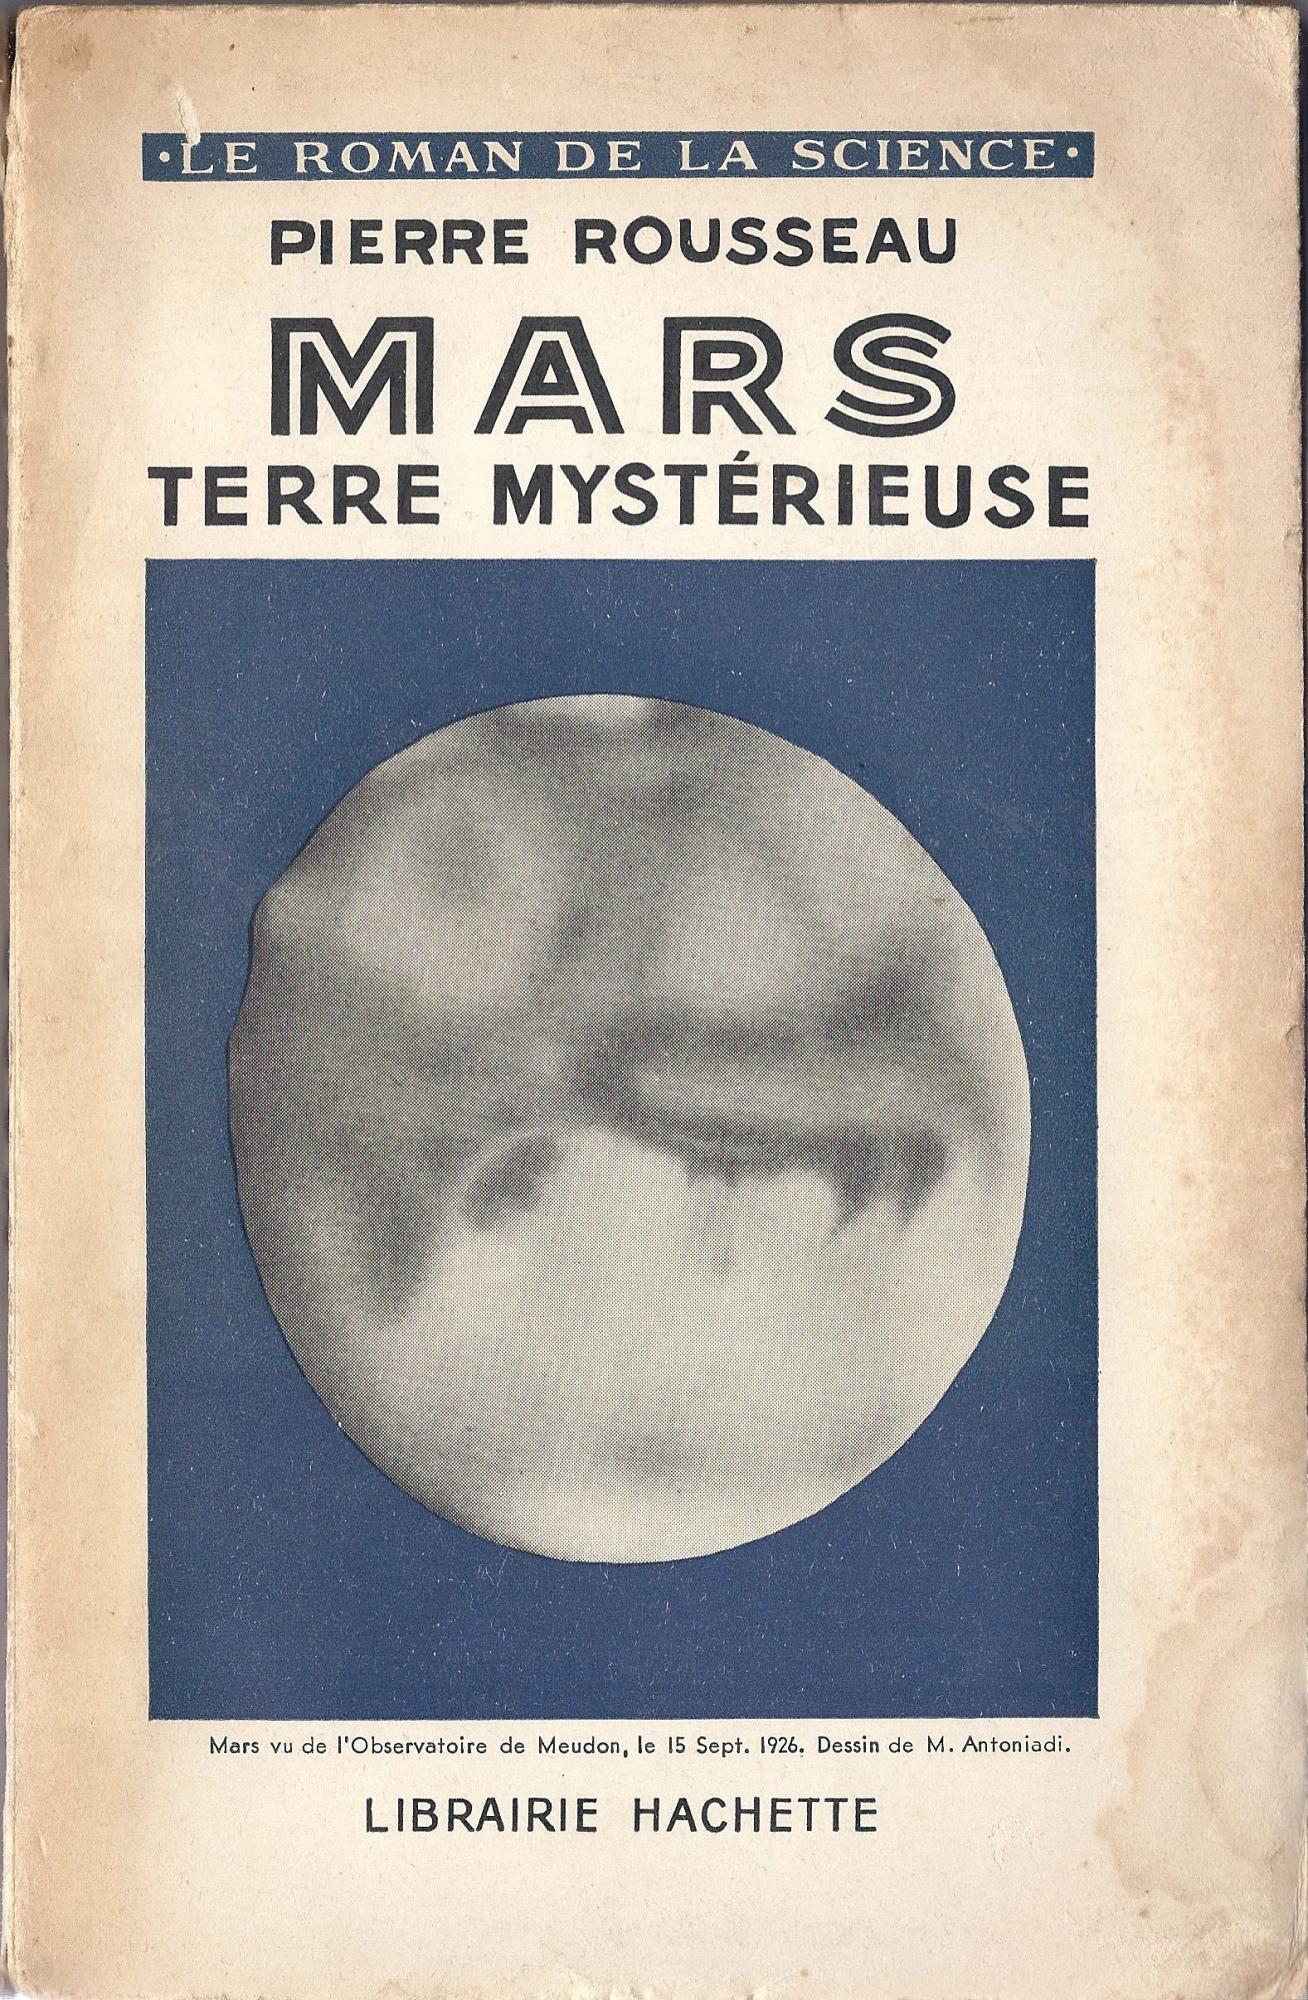 5f85928208186_Mars-Terre-mystrieuse_Pierre-Rousseau_Hachette-1941_couverture.thumb.JPG.223a9688050d4f73b58500245a8a7ab9.JPG